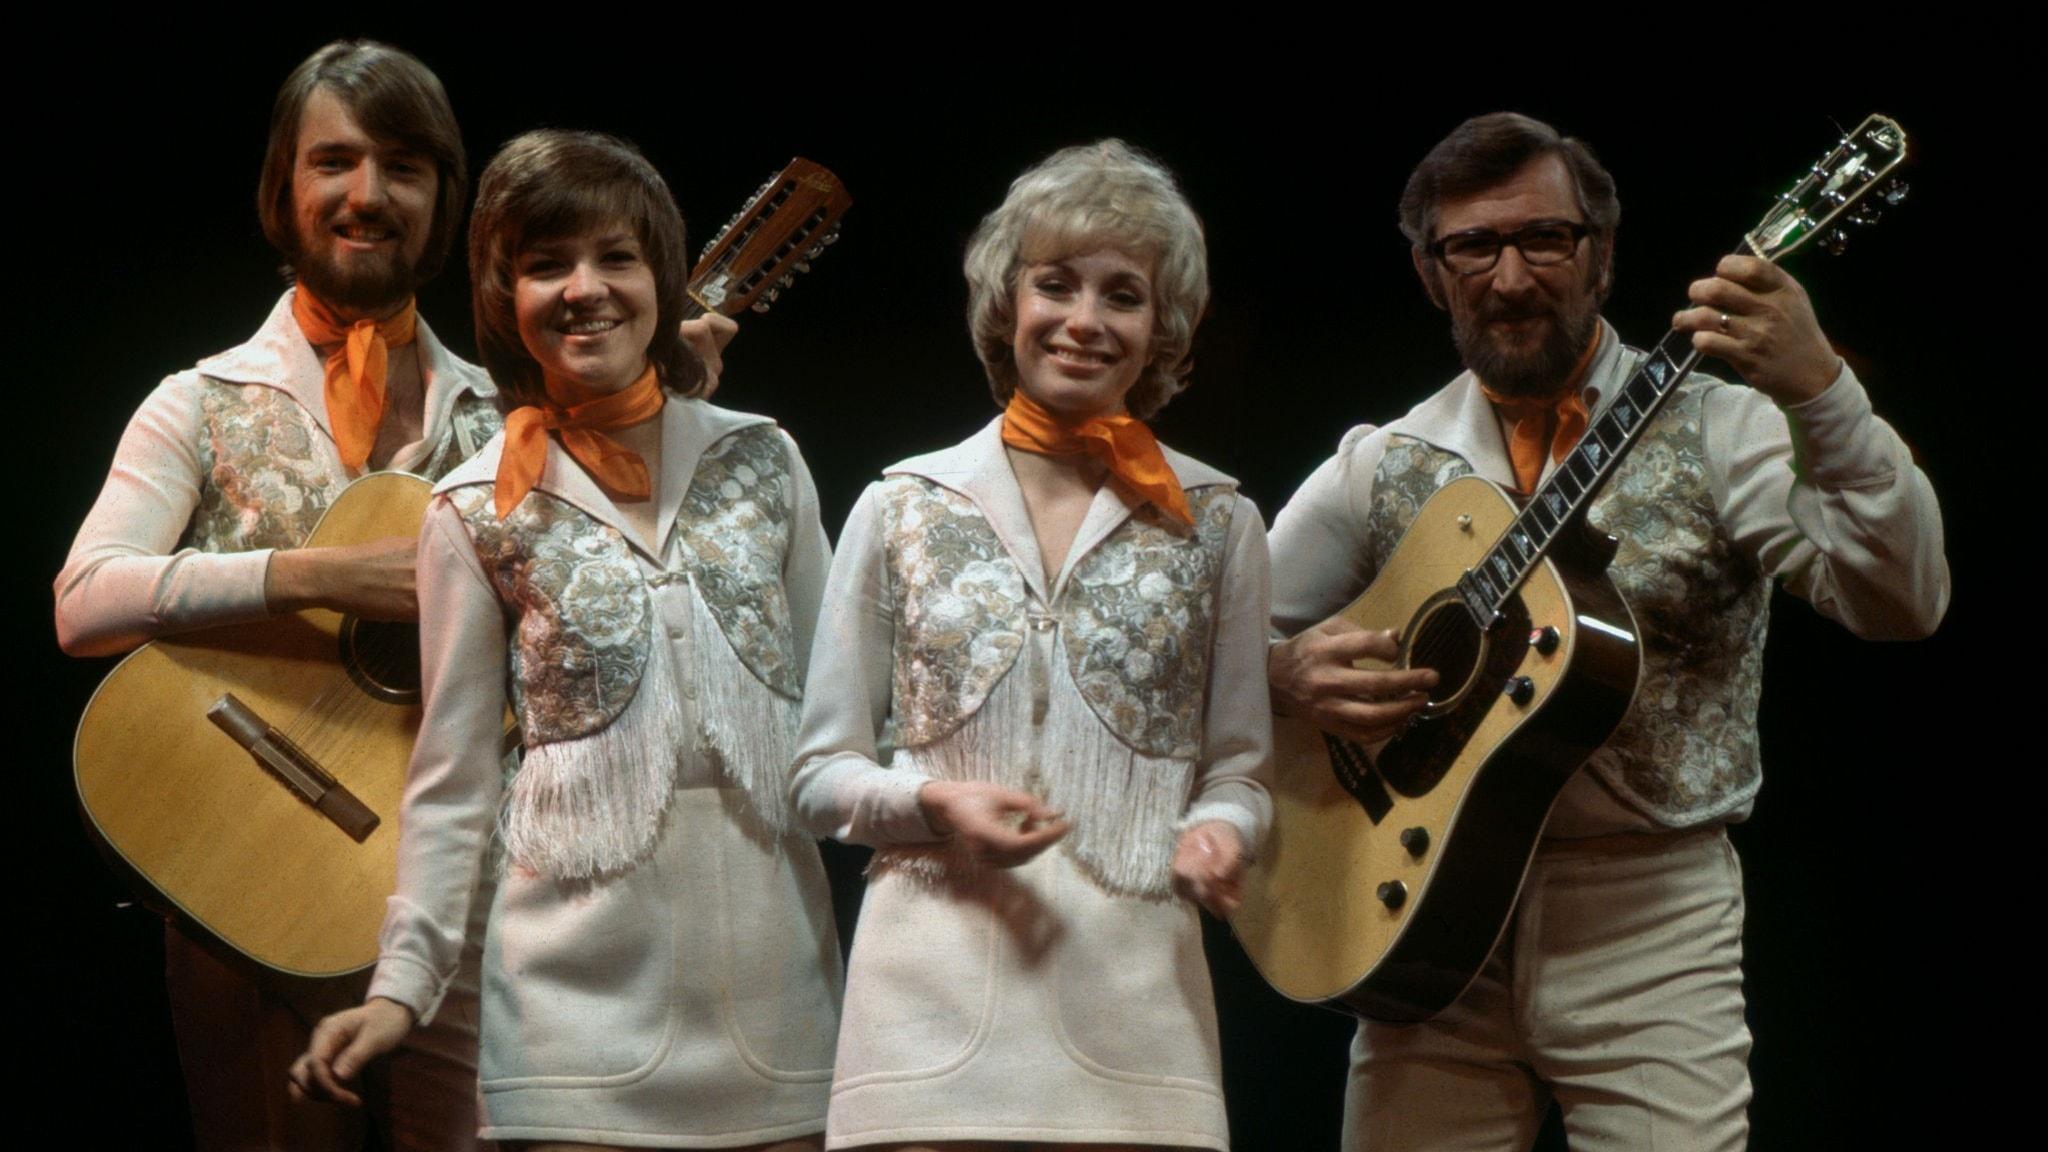 Family Four och Lena Andersson i dubbel dos på Svensktoppen den 6 juni 1971